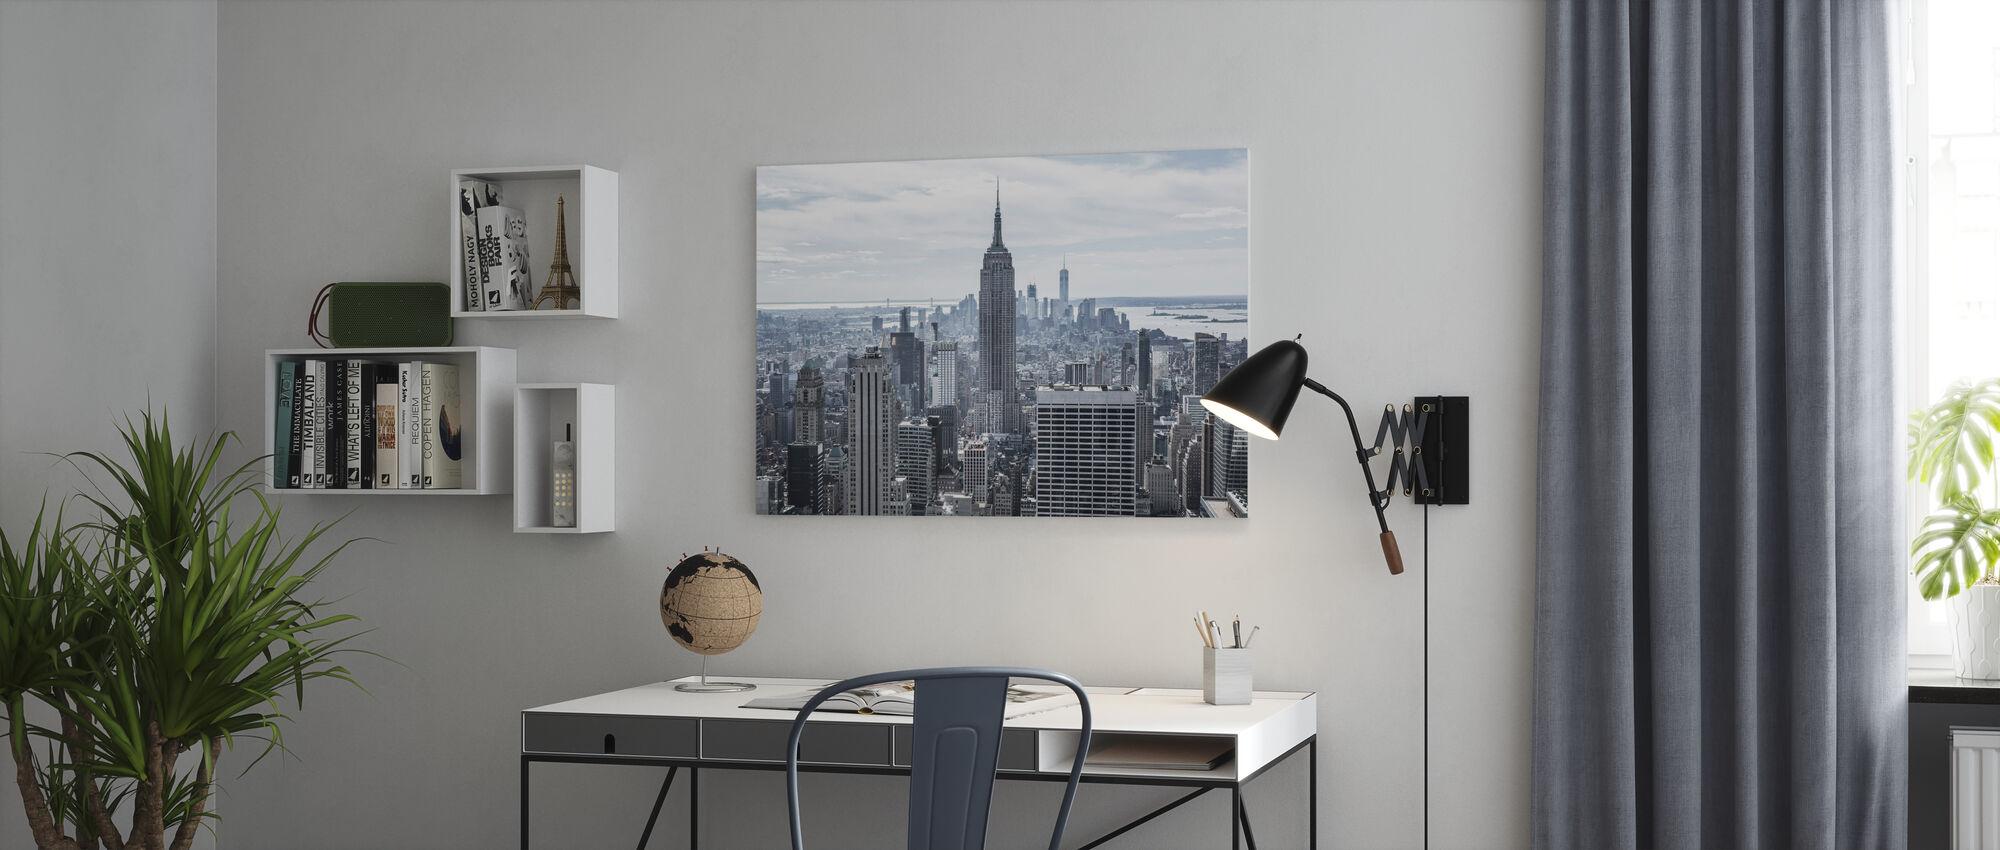 Empire State Building - Canvastavla - Kontor